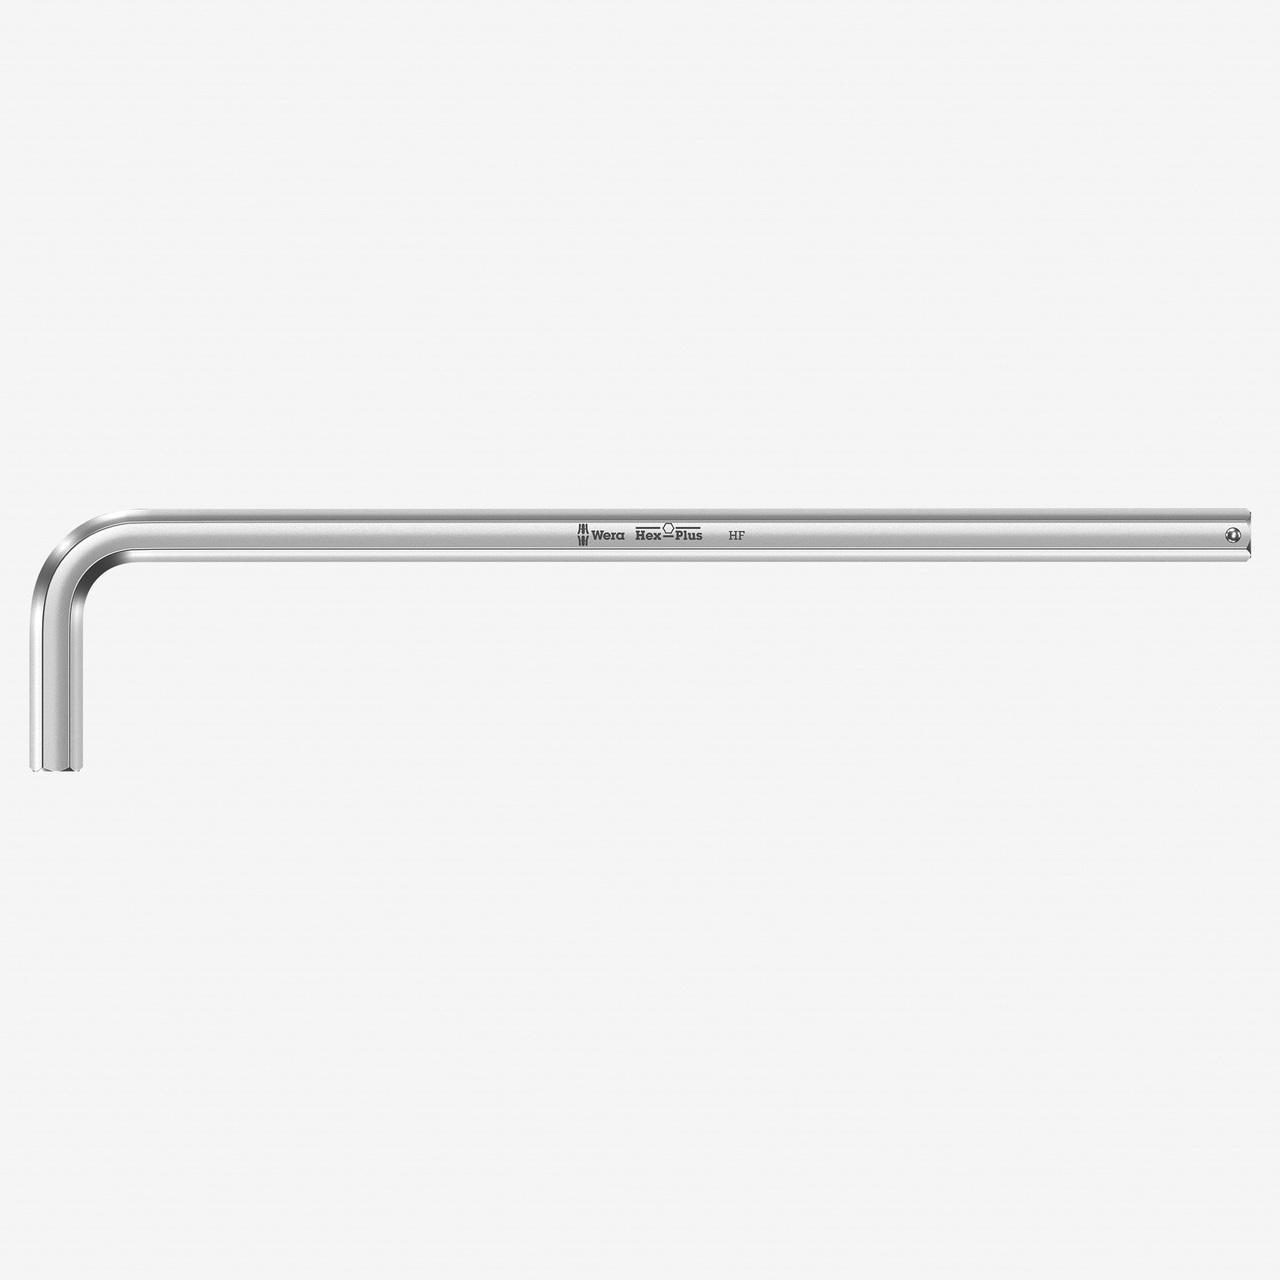 Wera 022125 Hex-Plus HF 10 x 219mm Chrome L-key - KC Tool